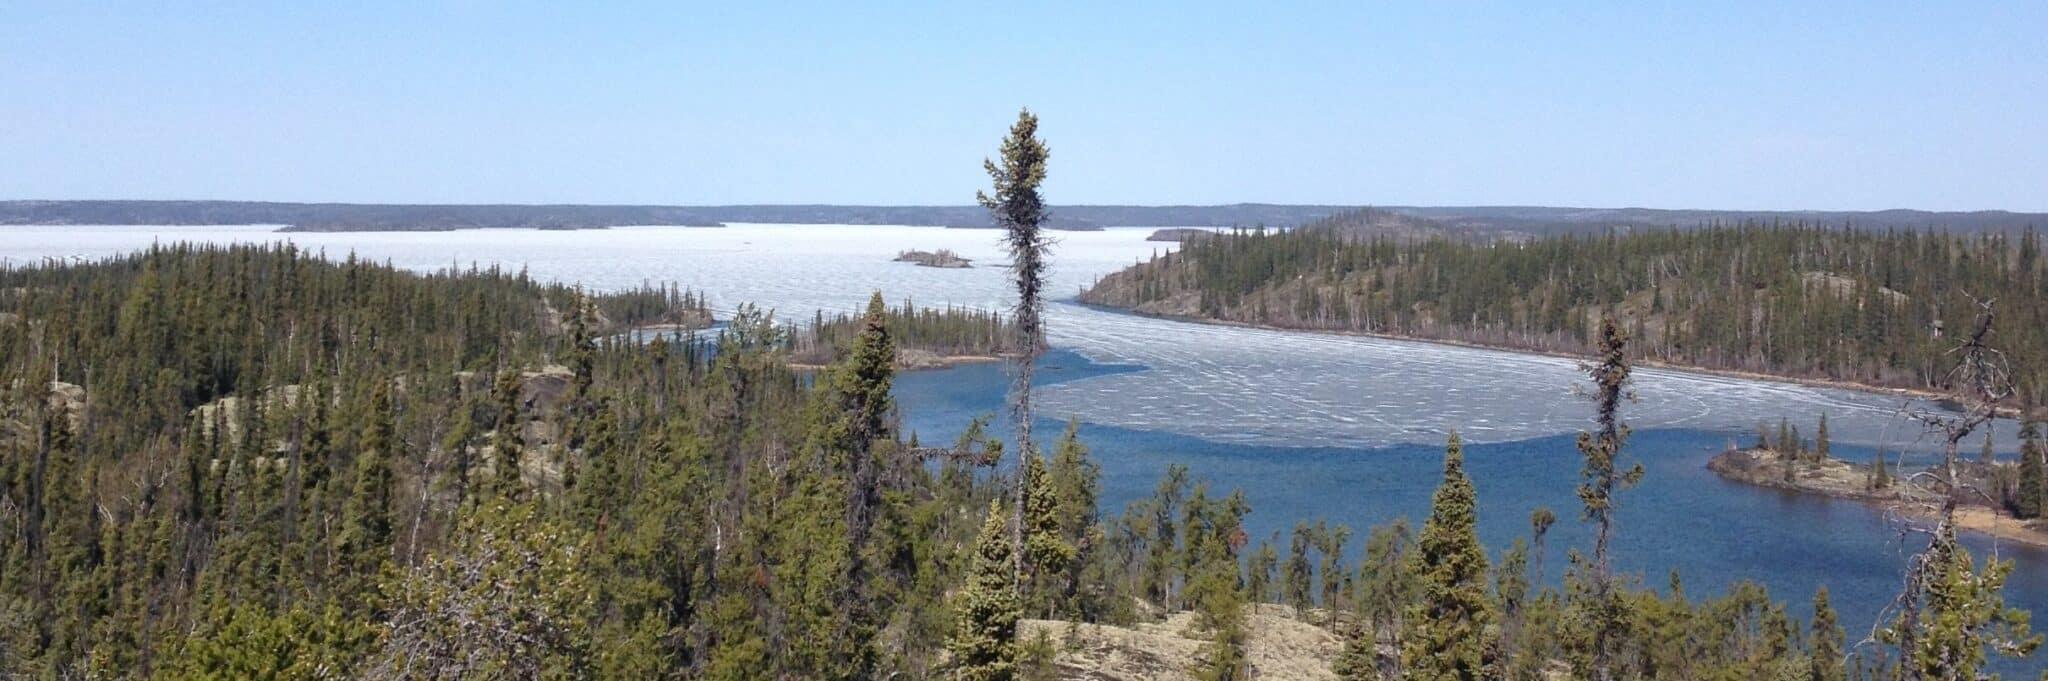 Prelude Lake Northwest Territories